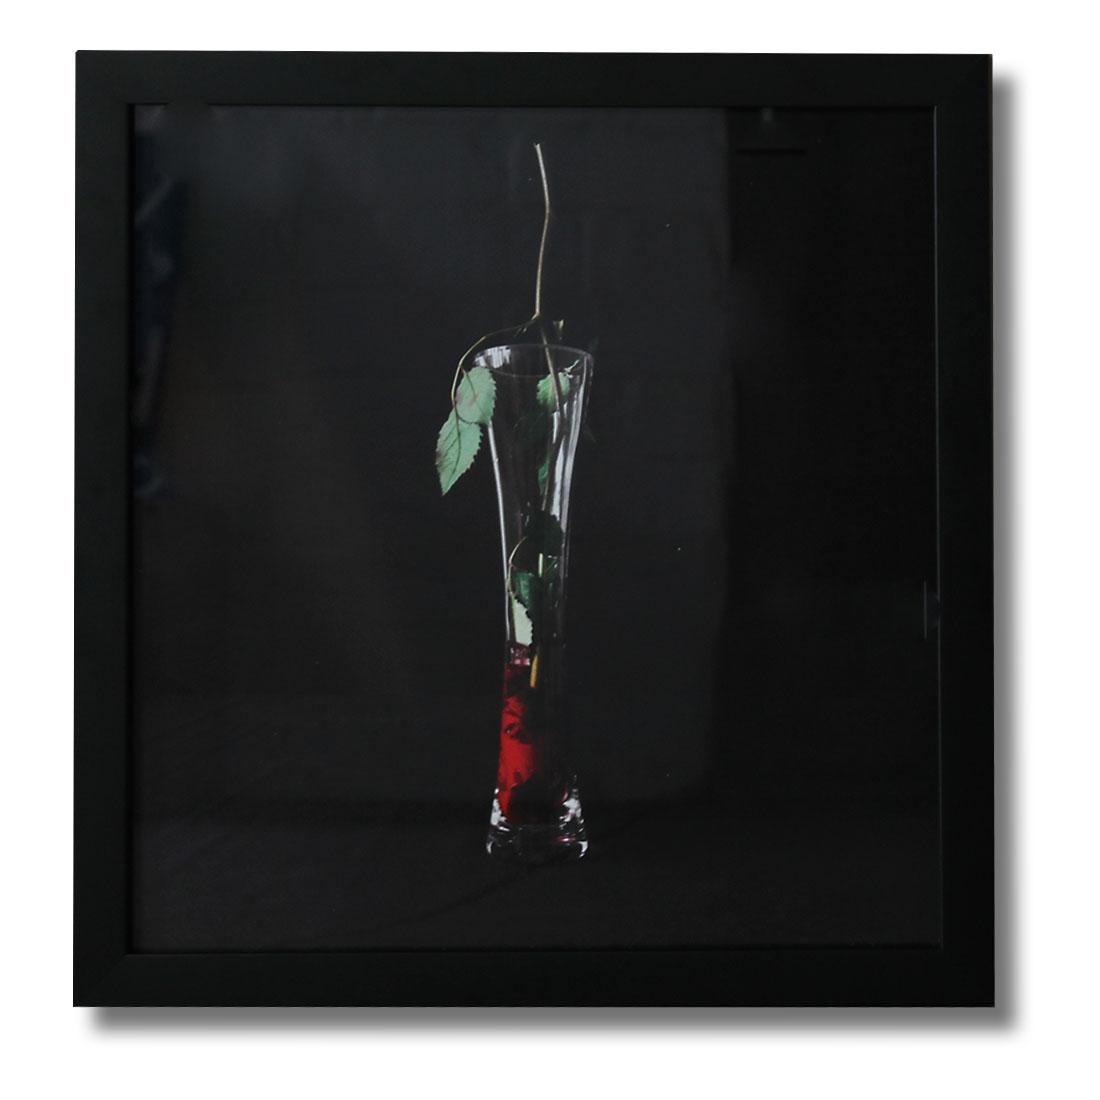 Iakovos Amperidis: Upturned Flower in Vase, 2013. Framed digital print on paper, 30 x 30cm